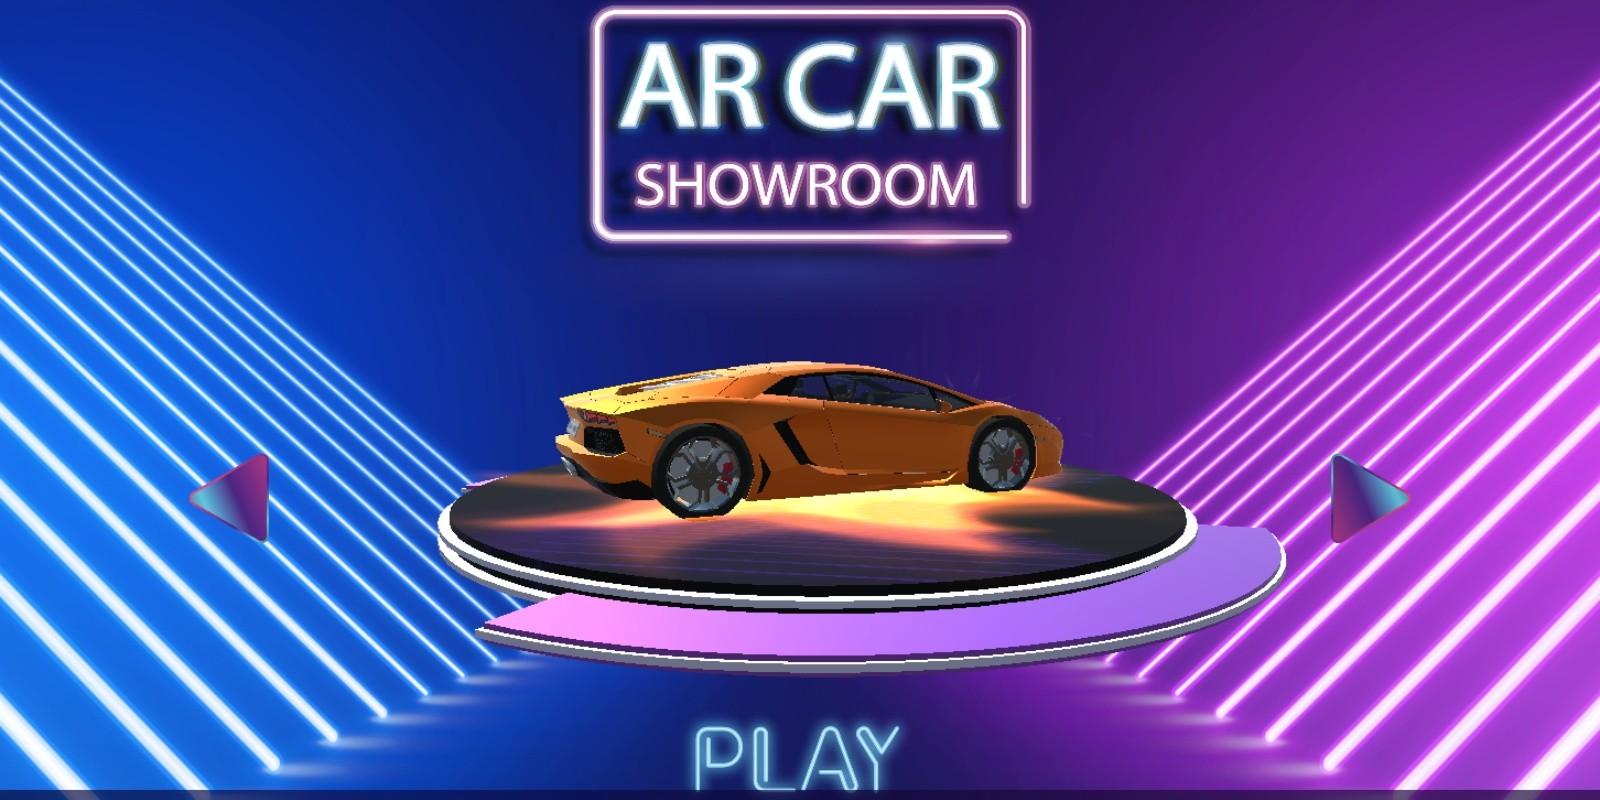 ARCar - Augmented Reality Car Showroom App